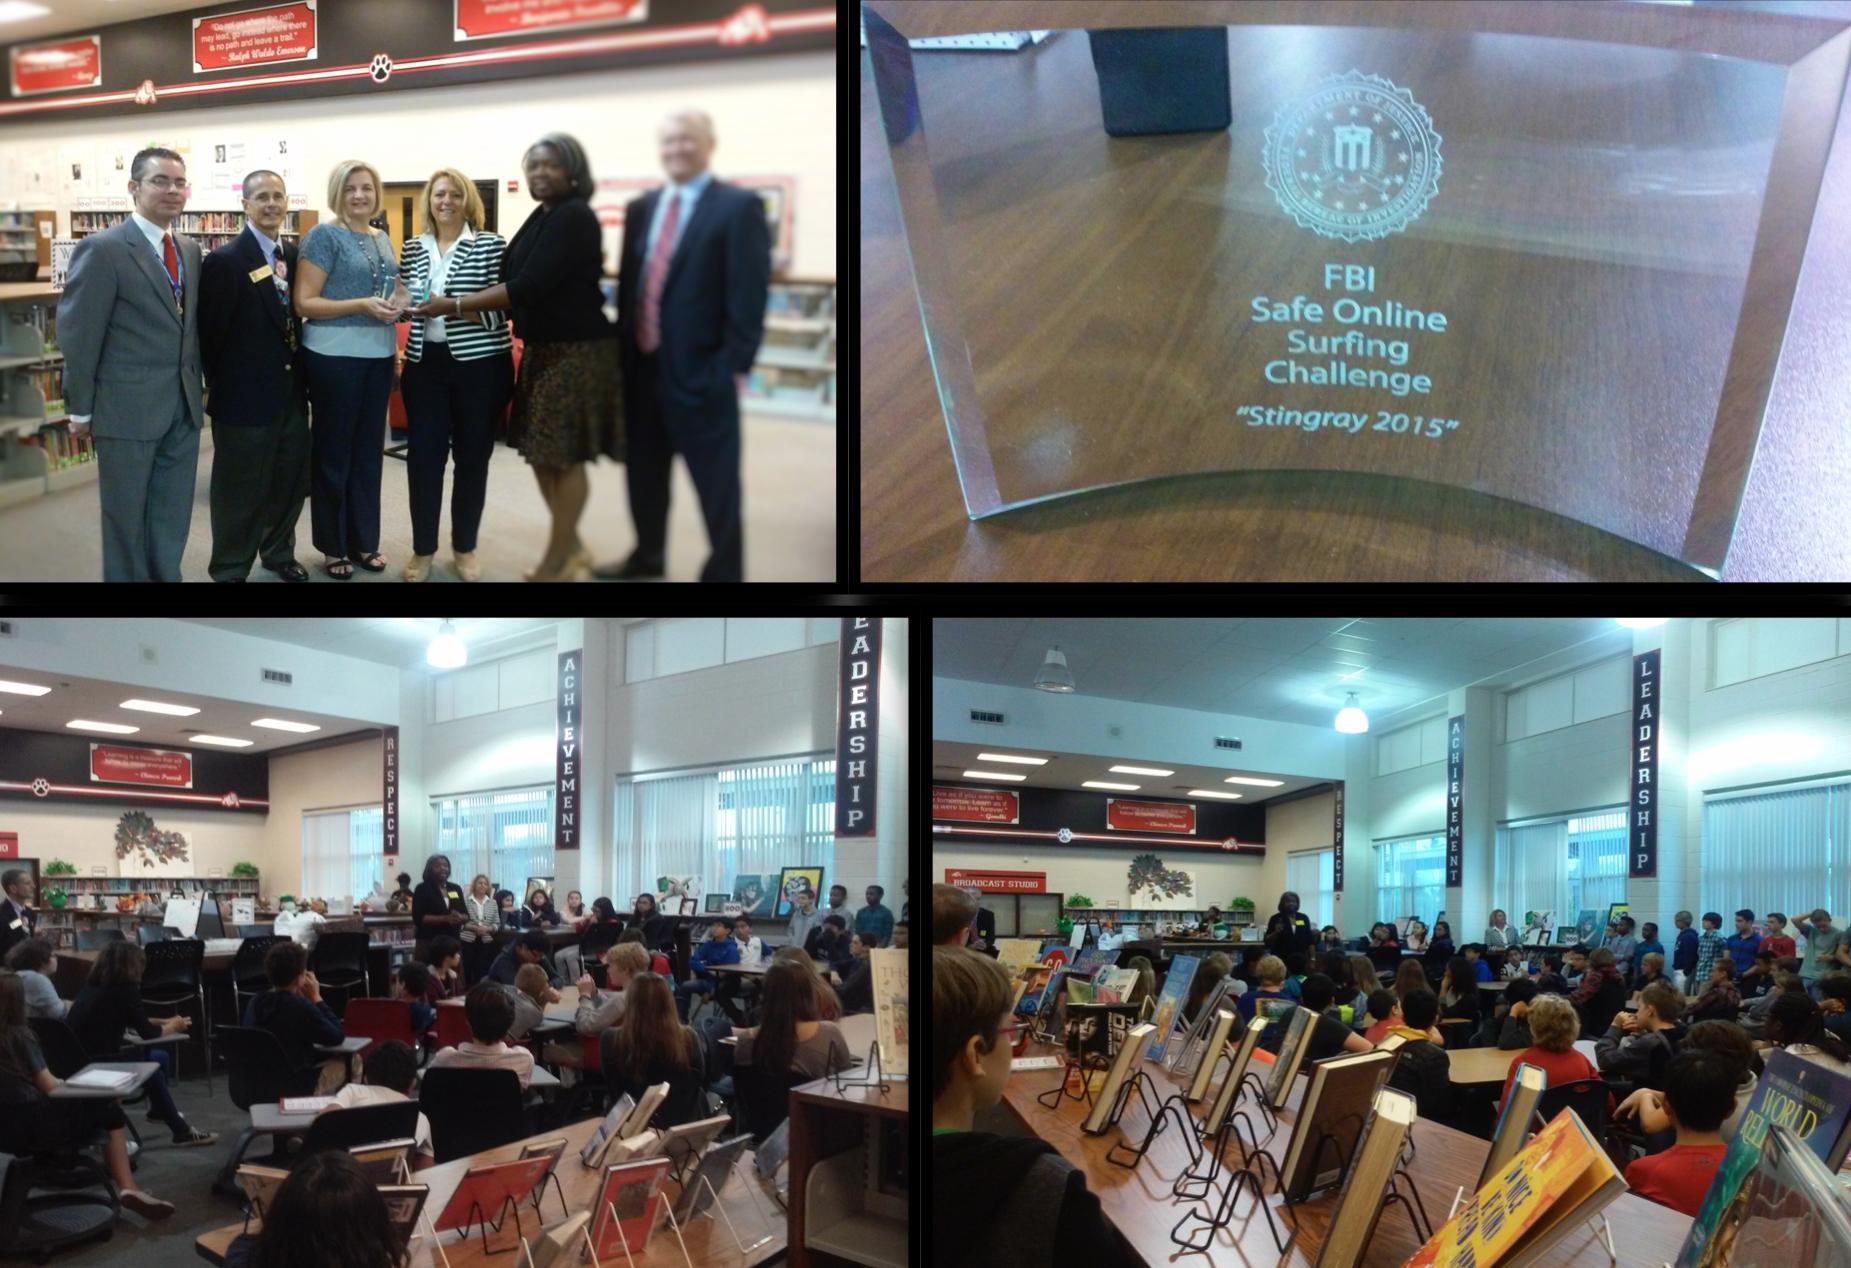 2015 FBI SOS Trophy Presentation